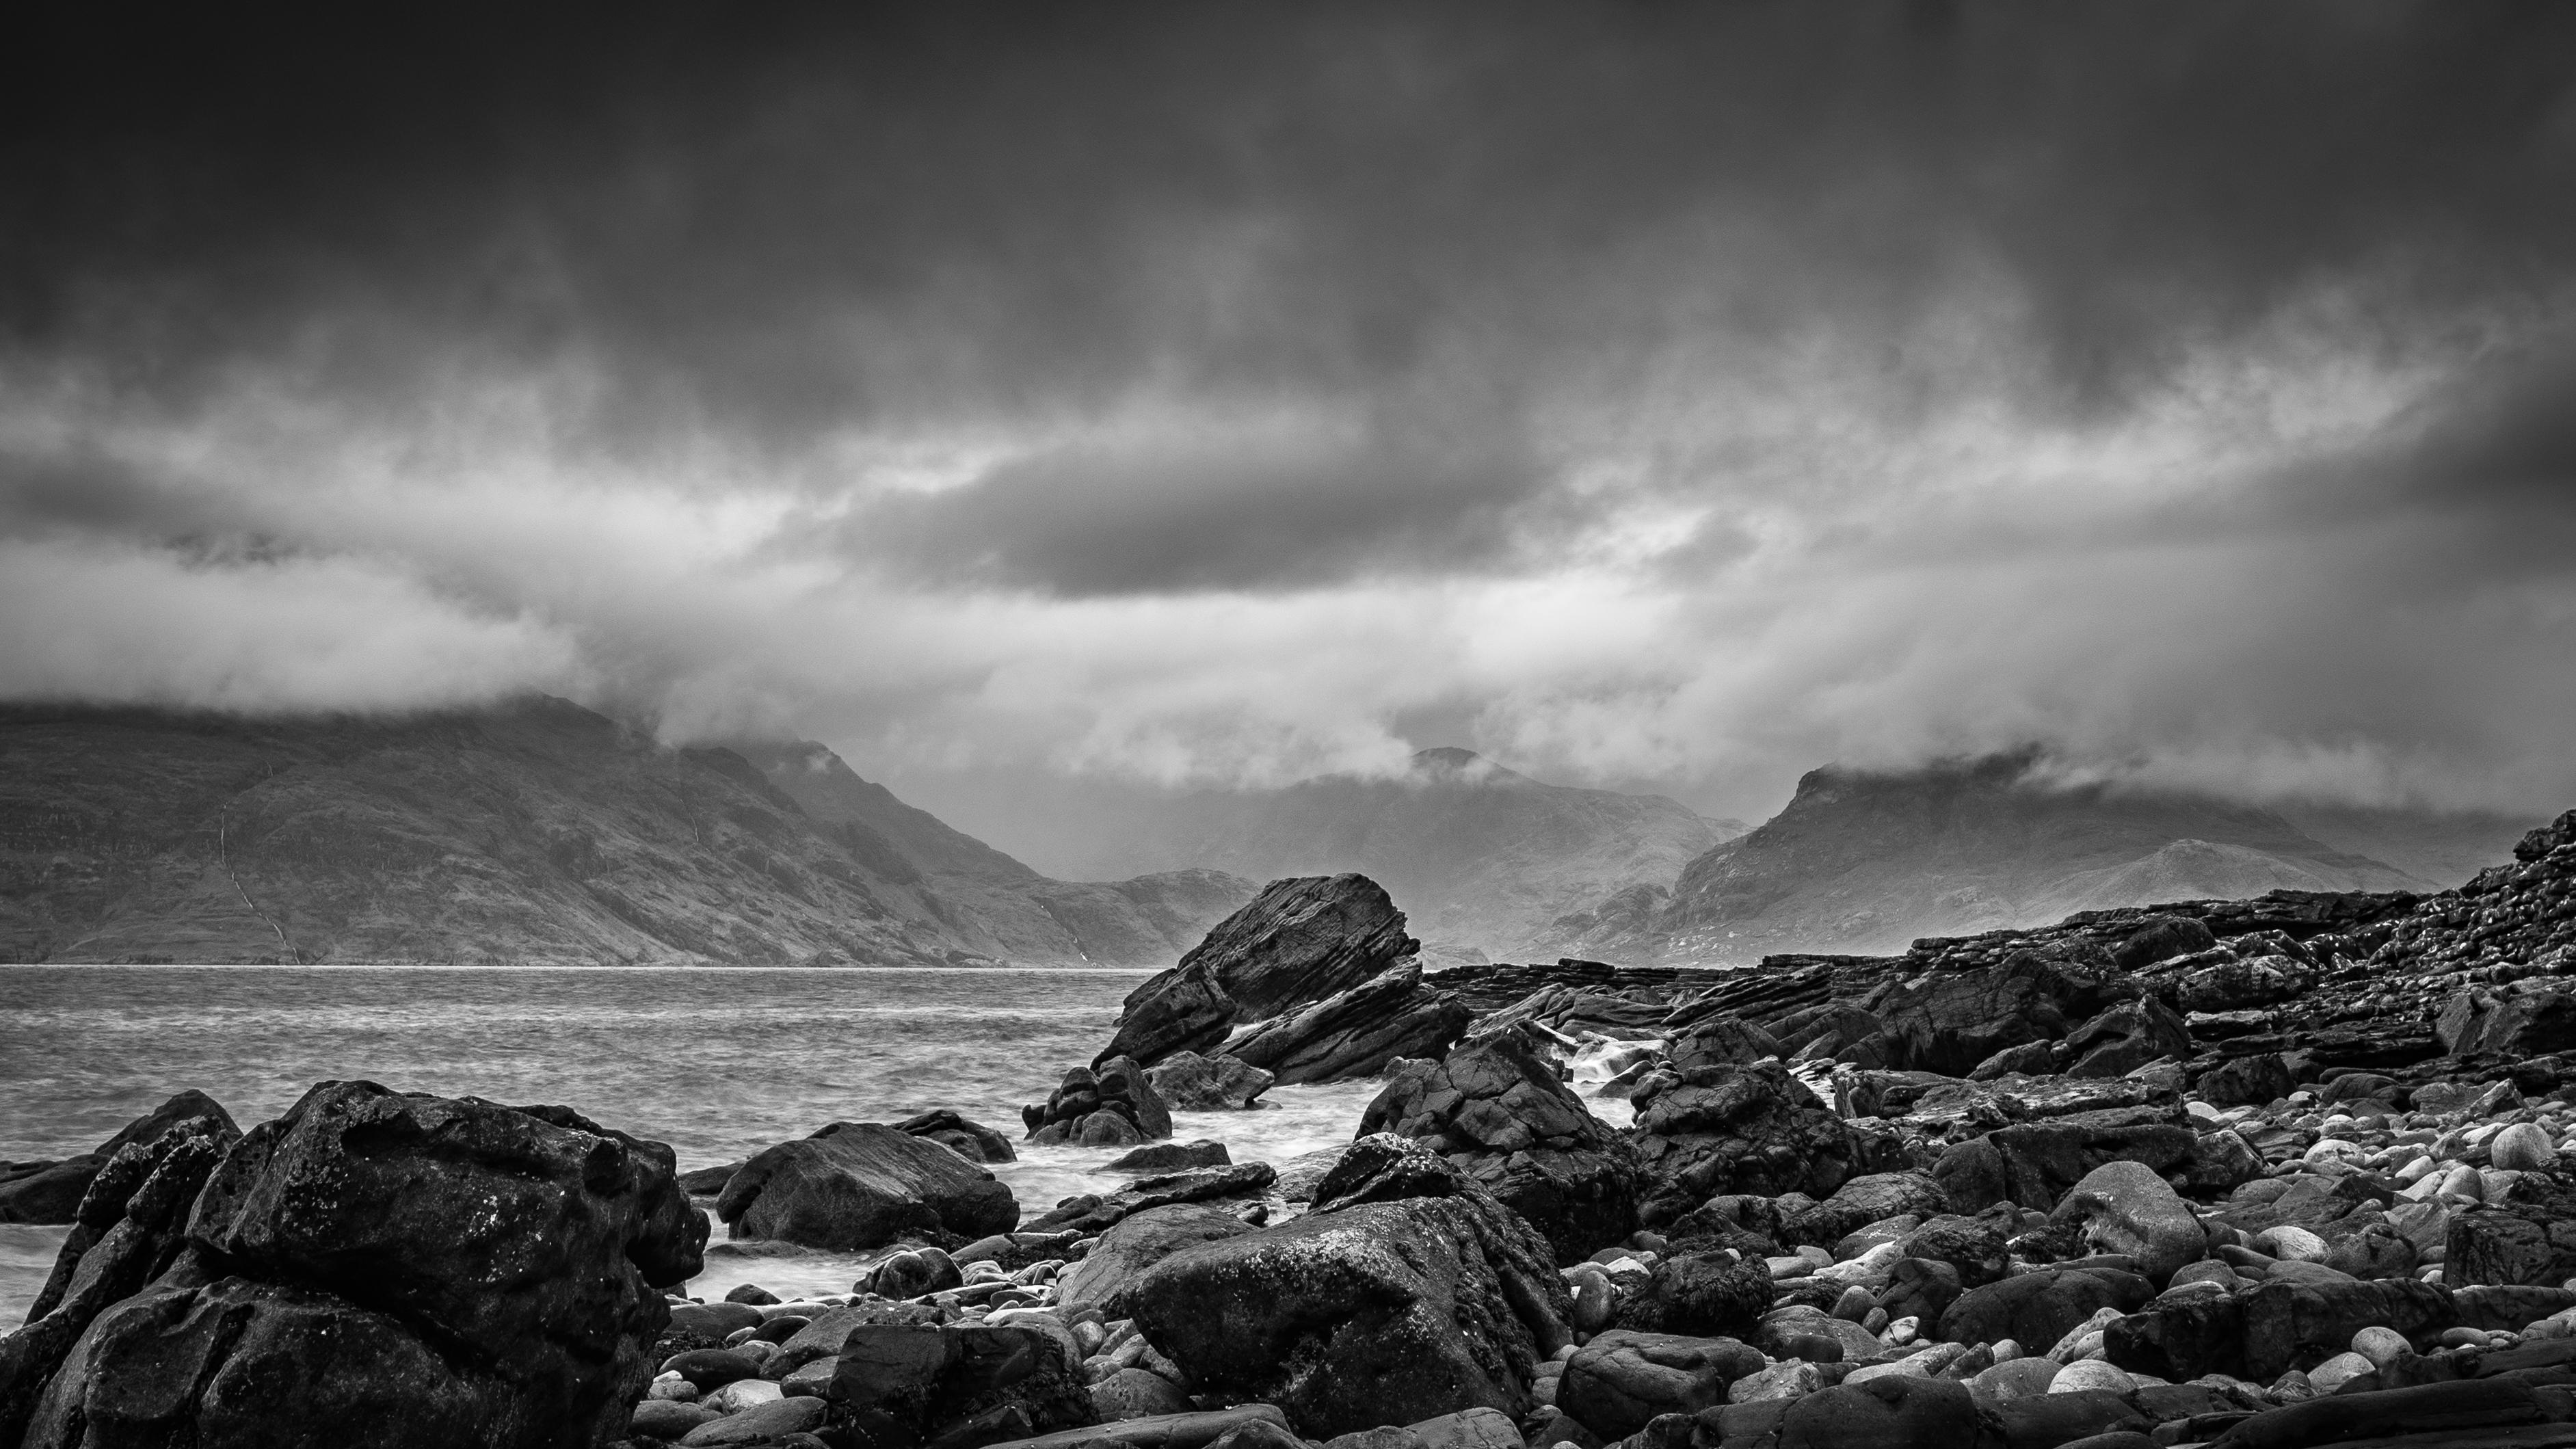 Free images landscape sea coast rock ocean horizon mountain snow cloud black and white sky weather storm darkness nikon rocks d750 skye